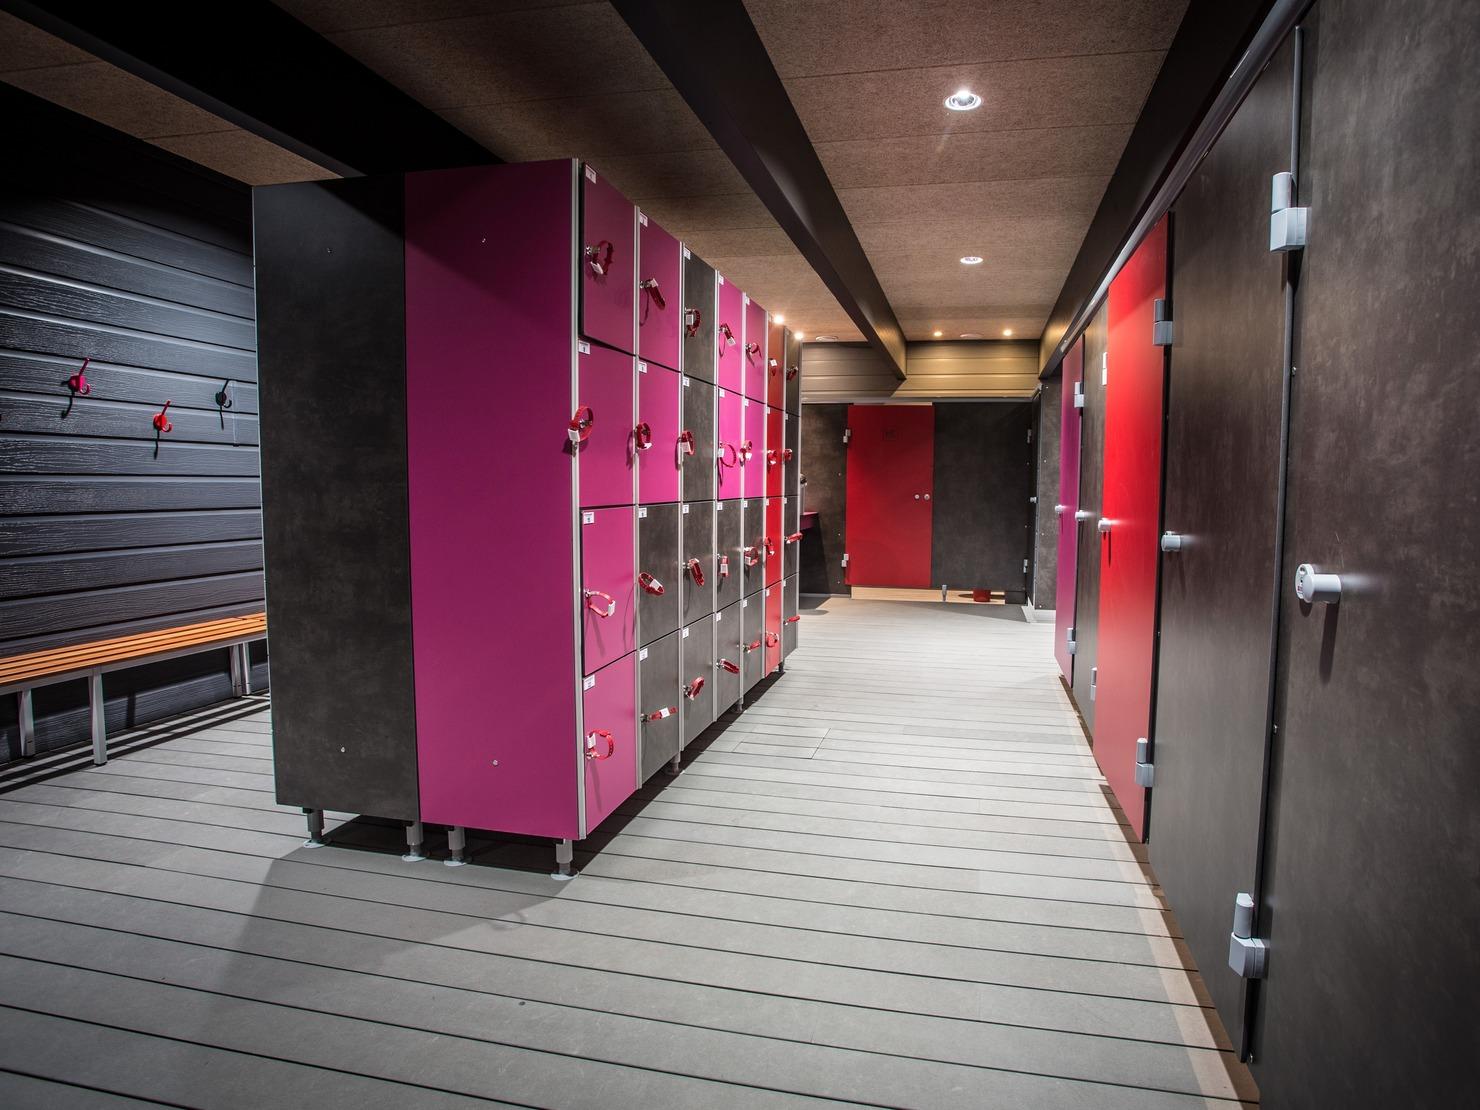 swimcenter toulouse balma tarifs avis horaires offre d couverte. Black Bedroom Furniture Sets. Home Design Ideas